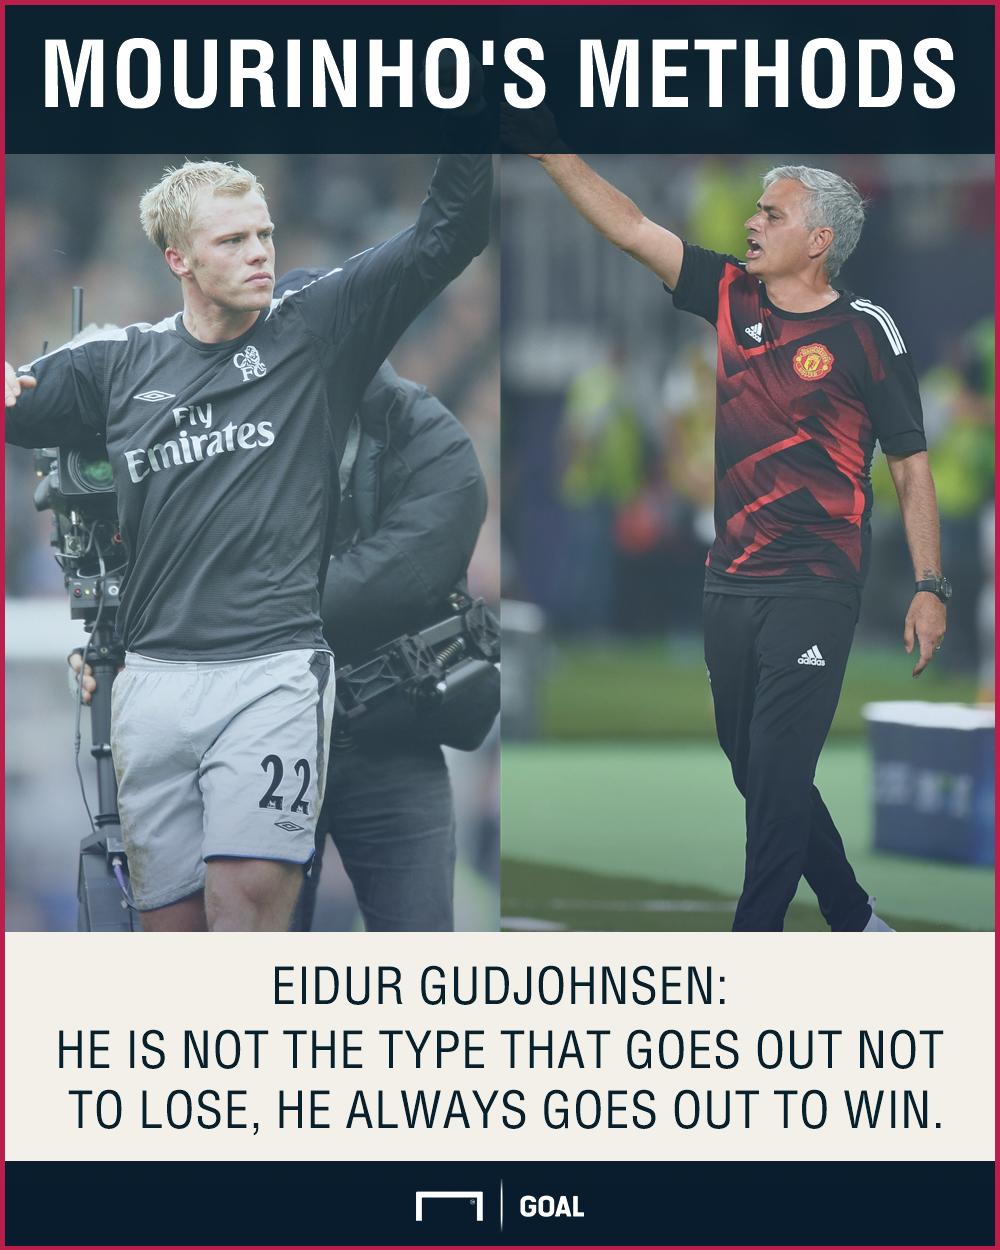 Eidur Gudjohnsen Jose Mourinho methods